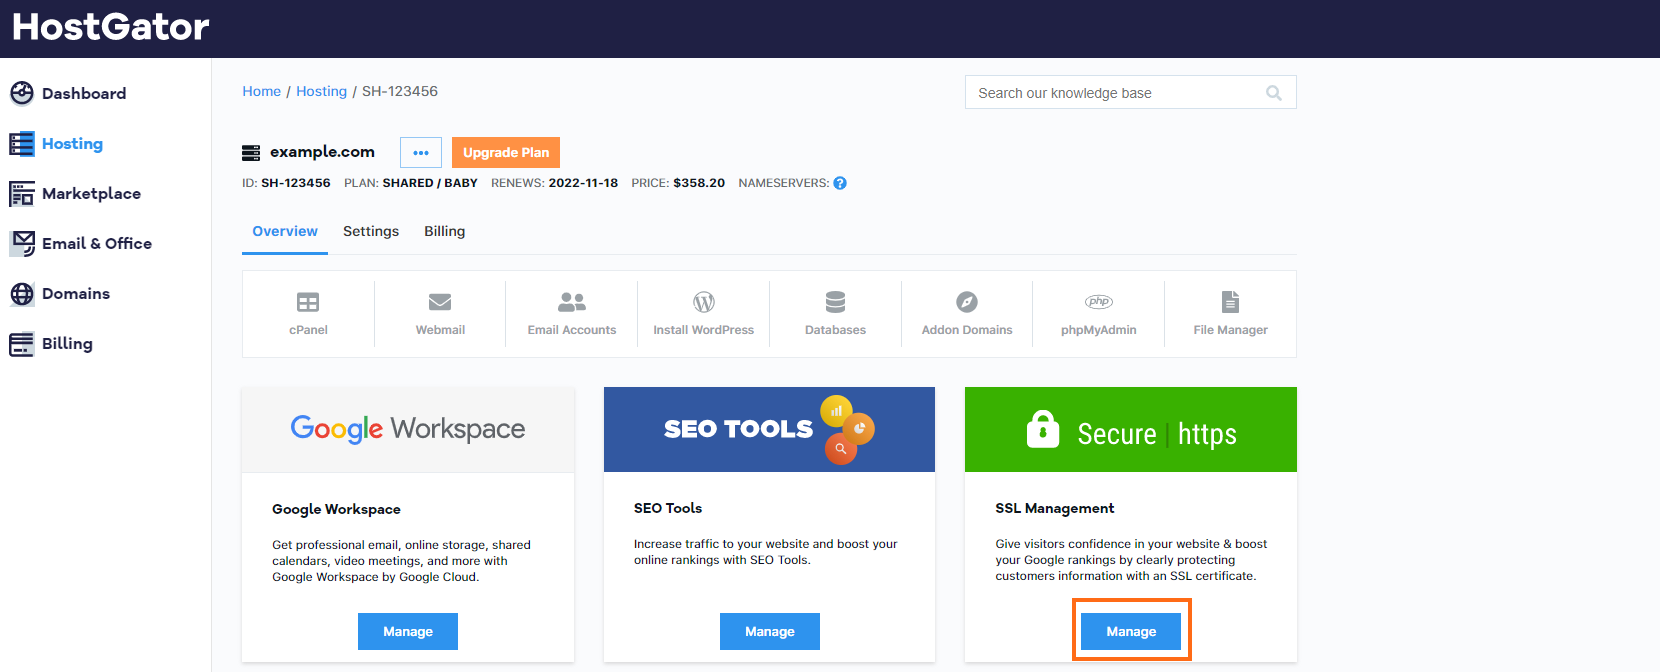 HostGator Billing Portal Marketplace